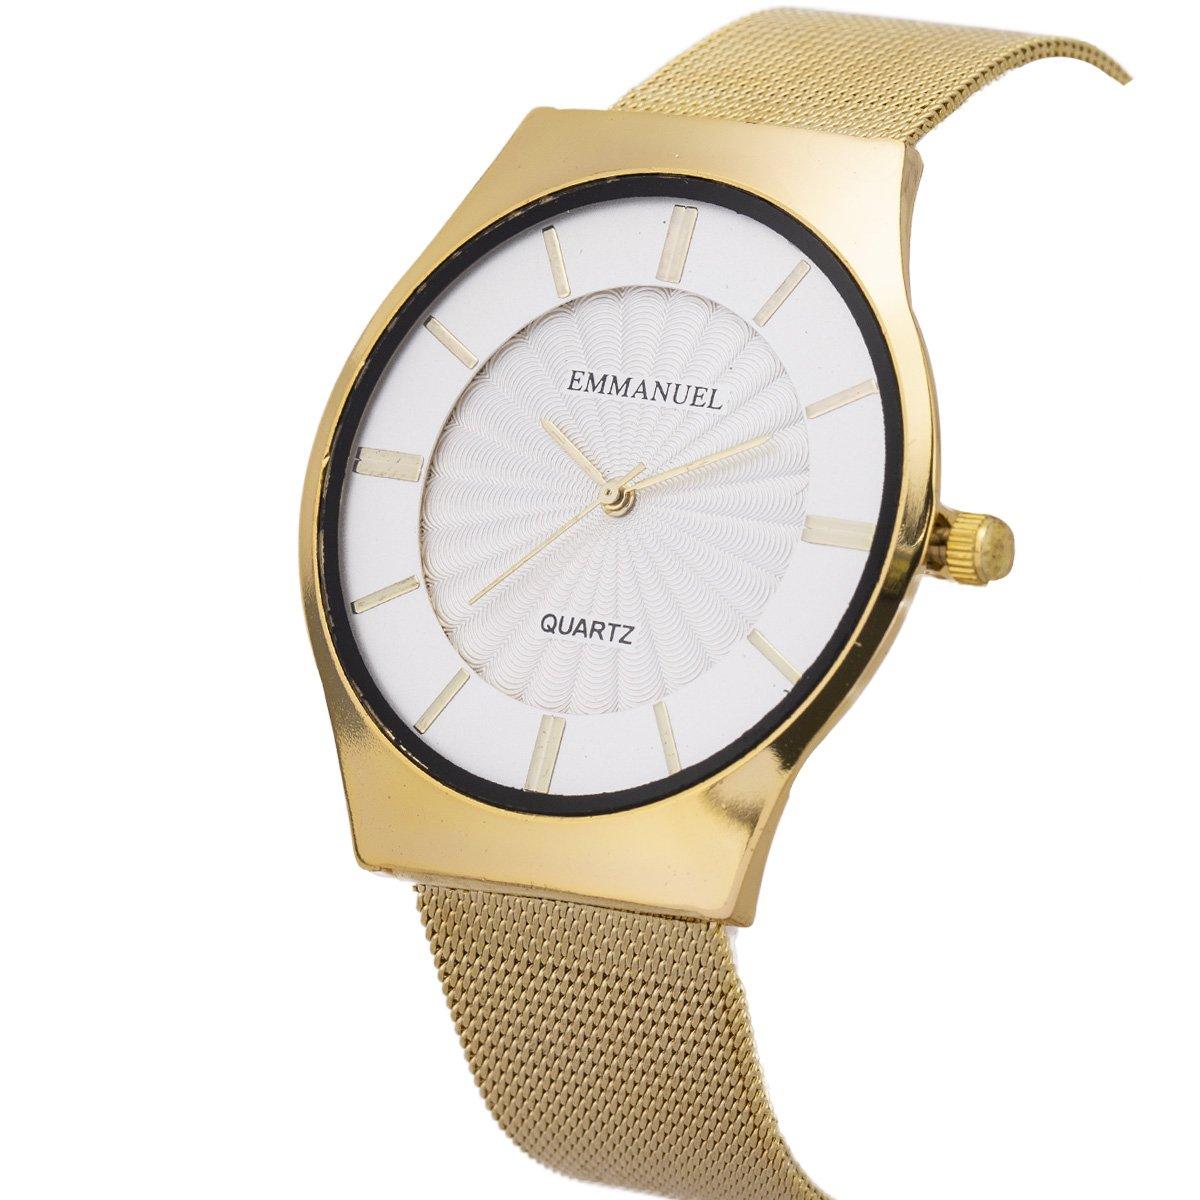 Wrist Watch Men Ultra-Thin Minimalist Mesh Stainless Steel Band SIBOSUN Quartz Analog Gold